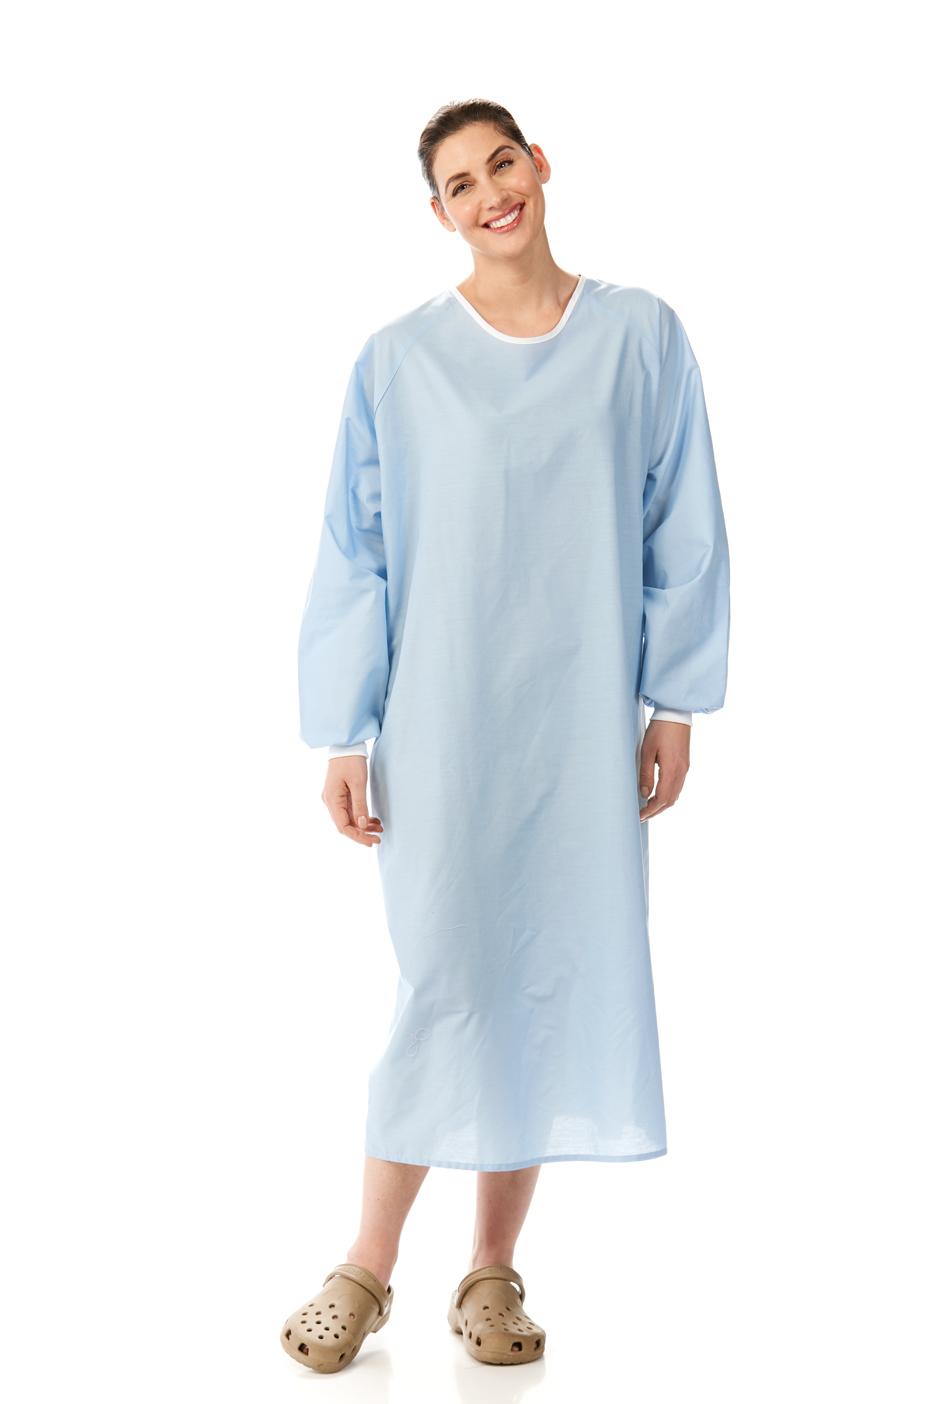 Women's Nurse Blouse